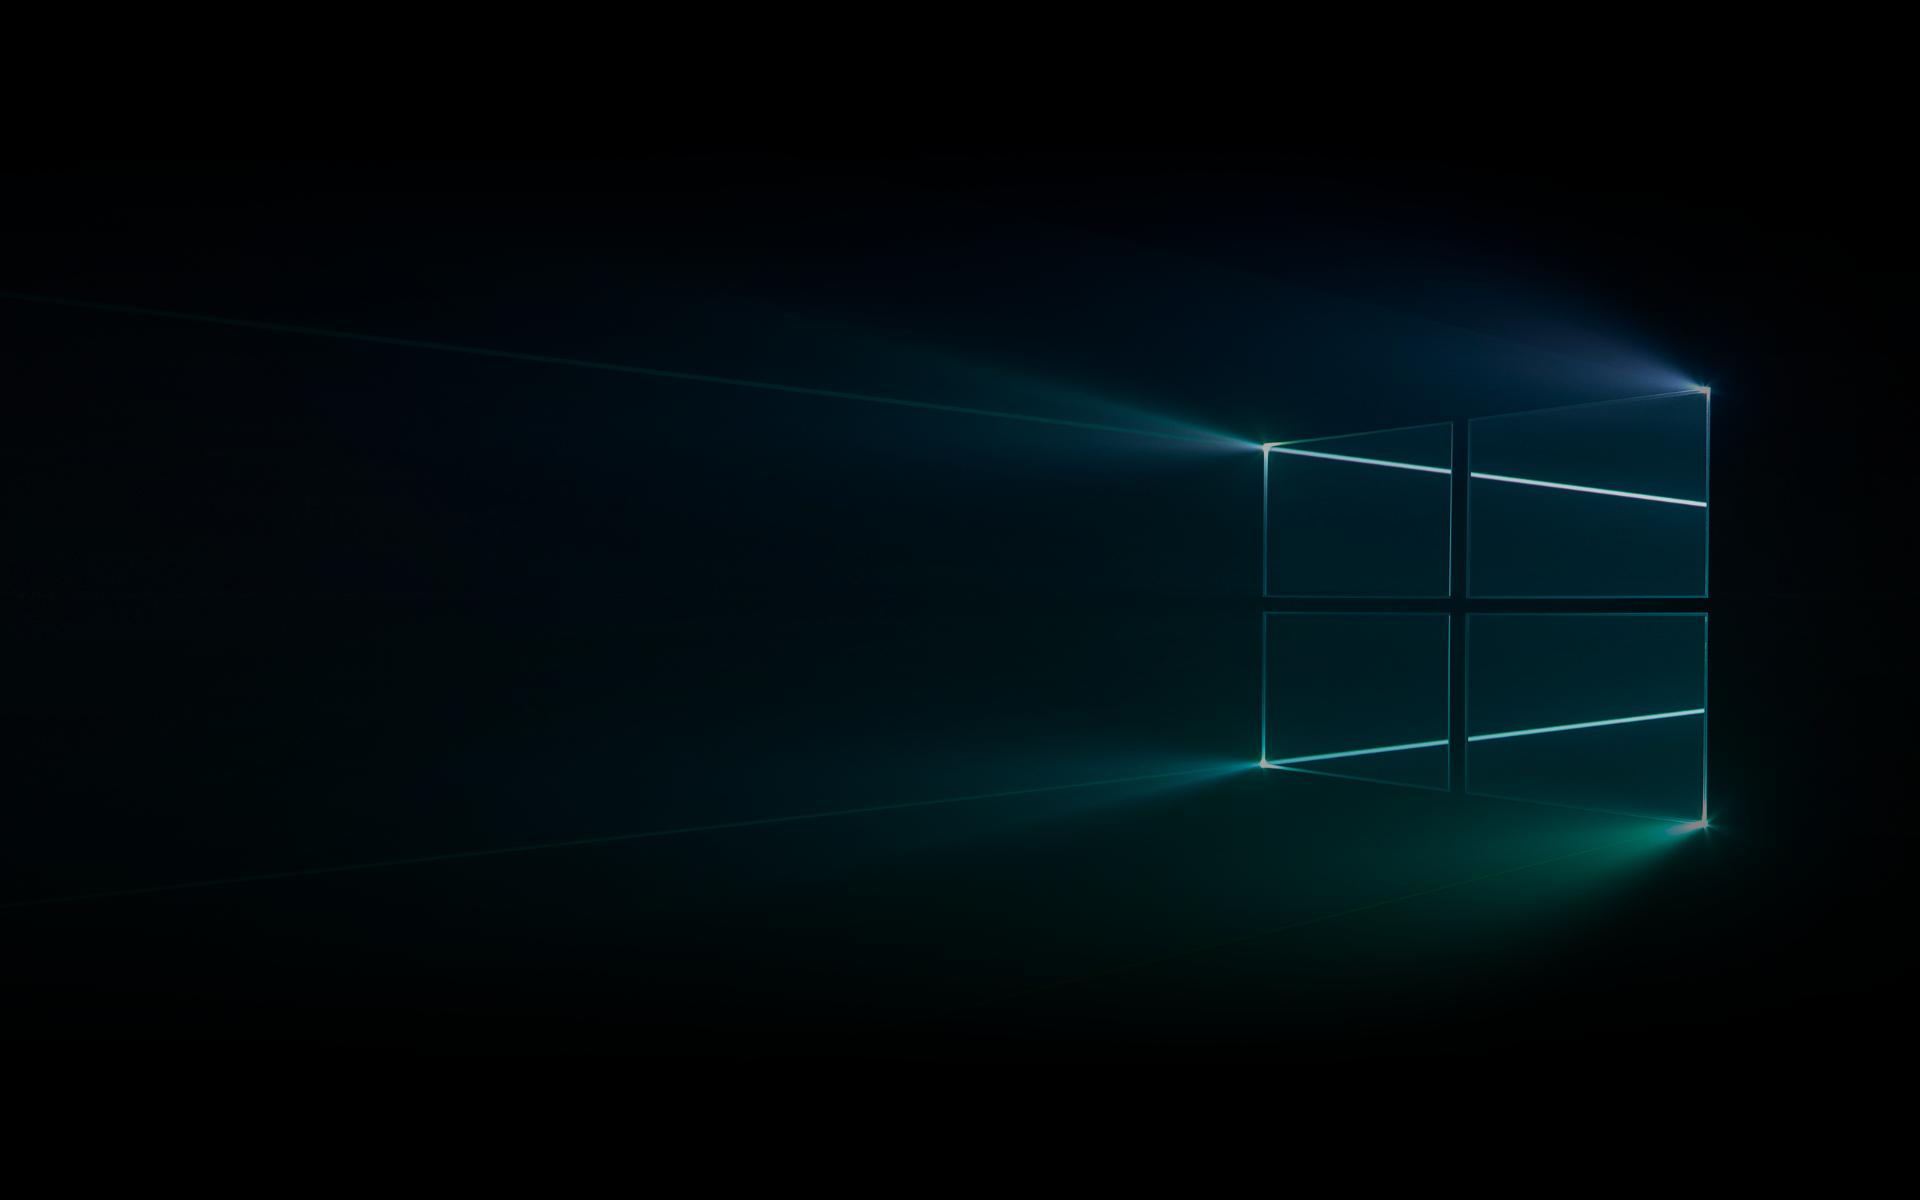 Dark Harmony Windows 10 Wallpaper By Minderiayoutuber On Deviantart